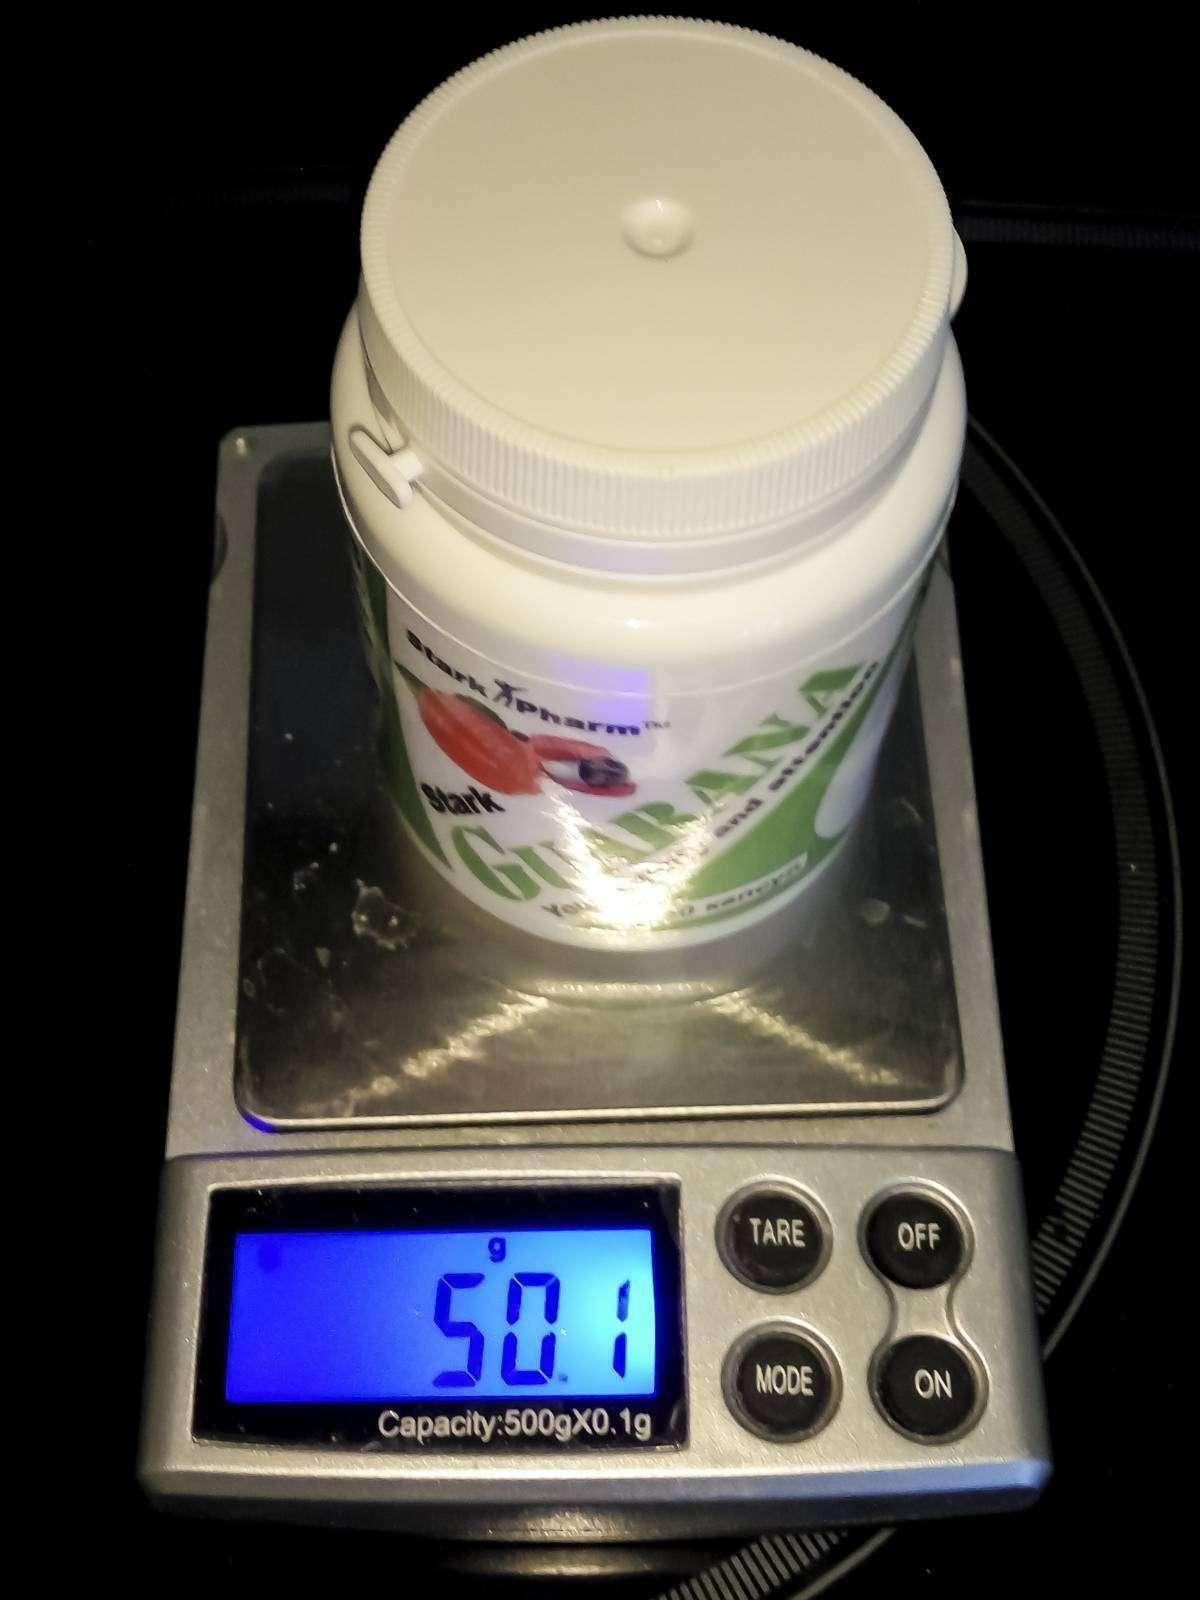 Proteininkiev: Предтренировочная добавка - Stark Guarana 600 мг 60 капсул